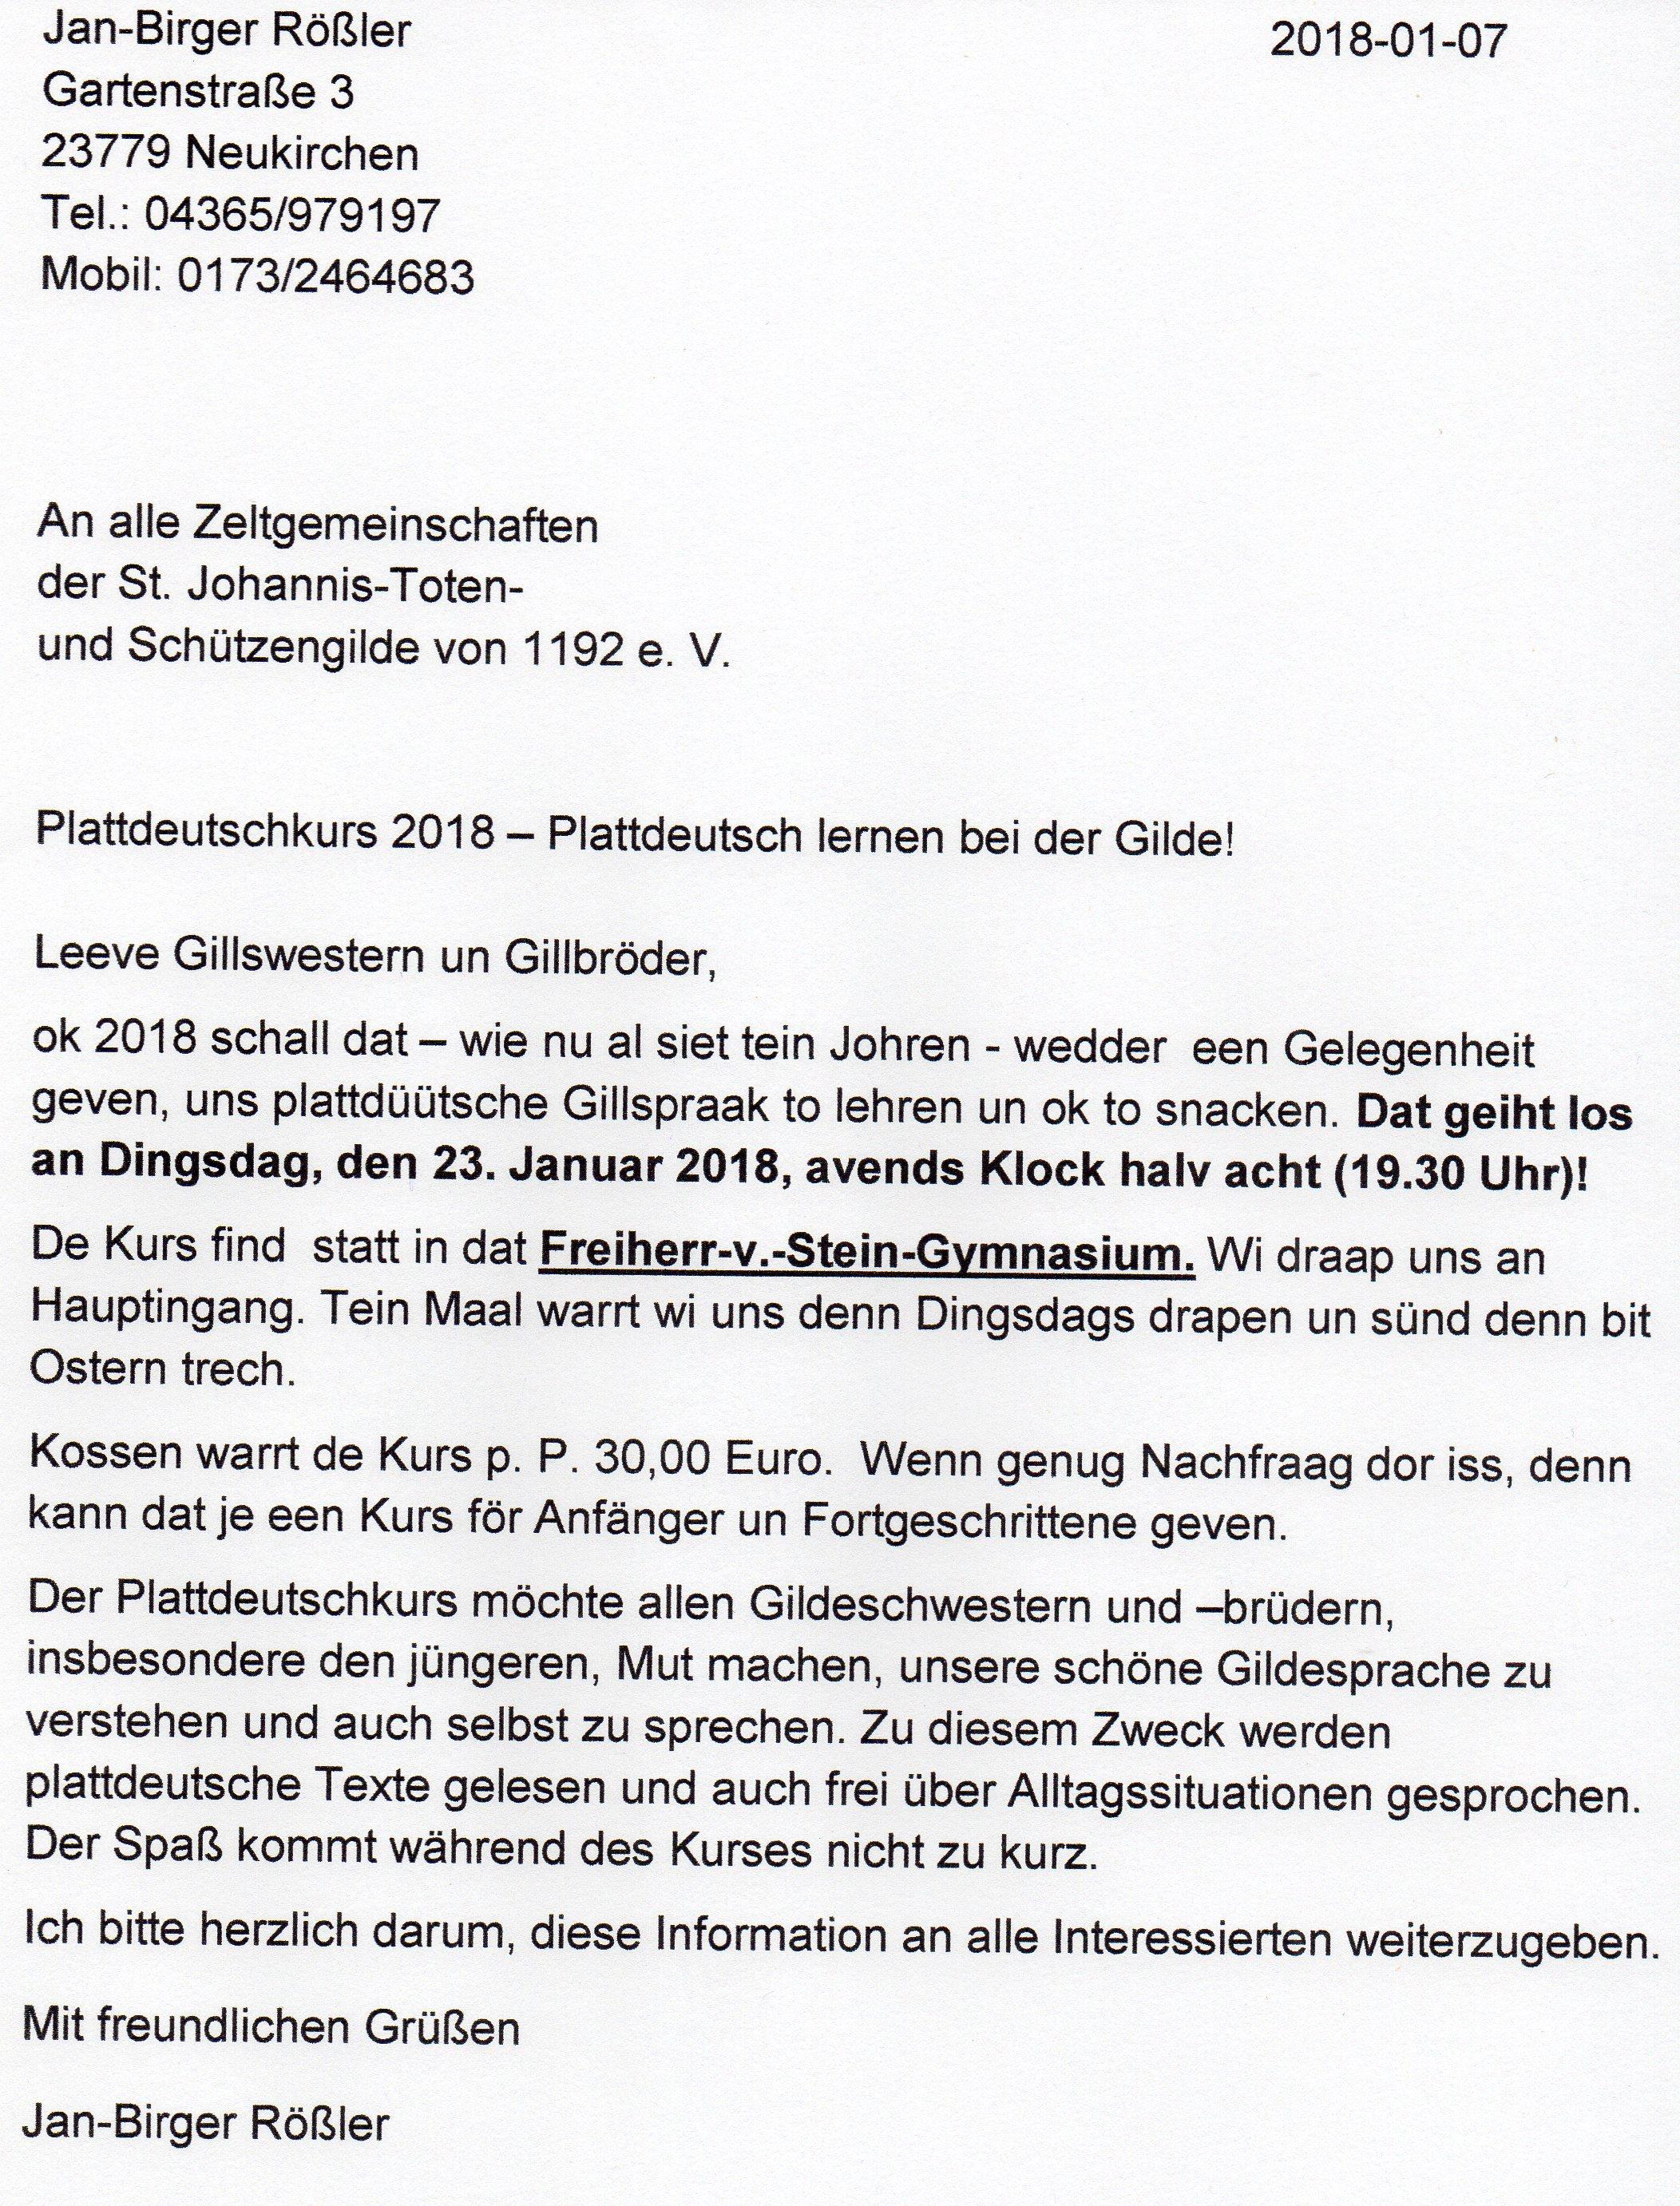 Weihnachtsgrüße Plattdeutsch.Bernd Schultz St Johannis Toten Und Schützengilde V 1192 E V